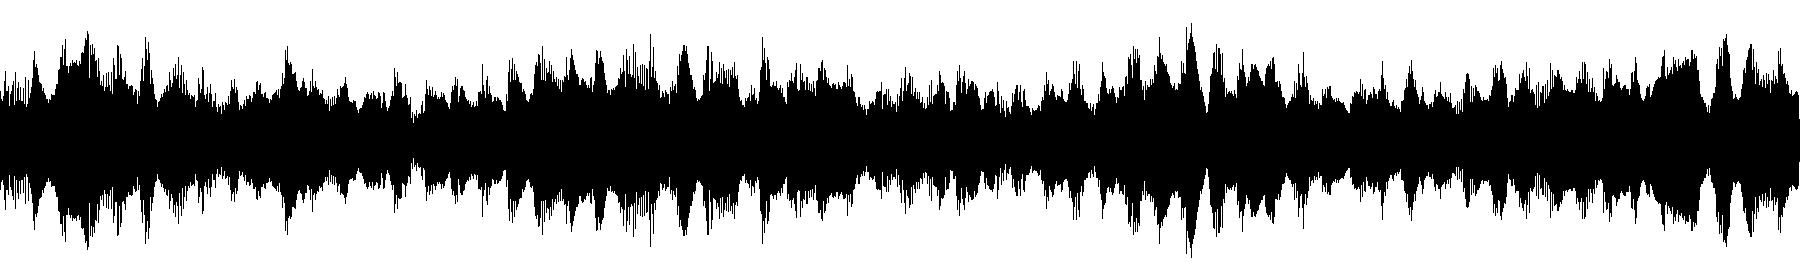 seq3 160